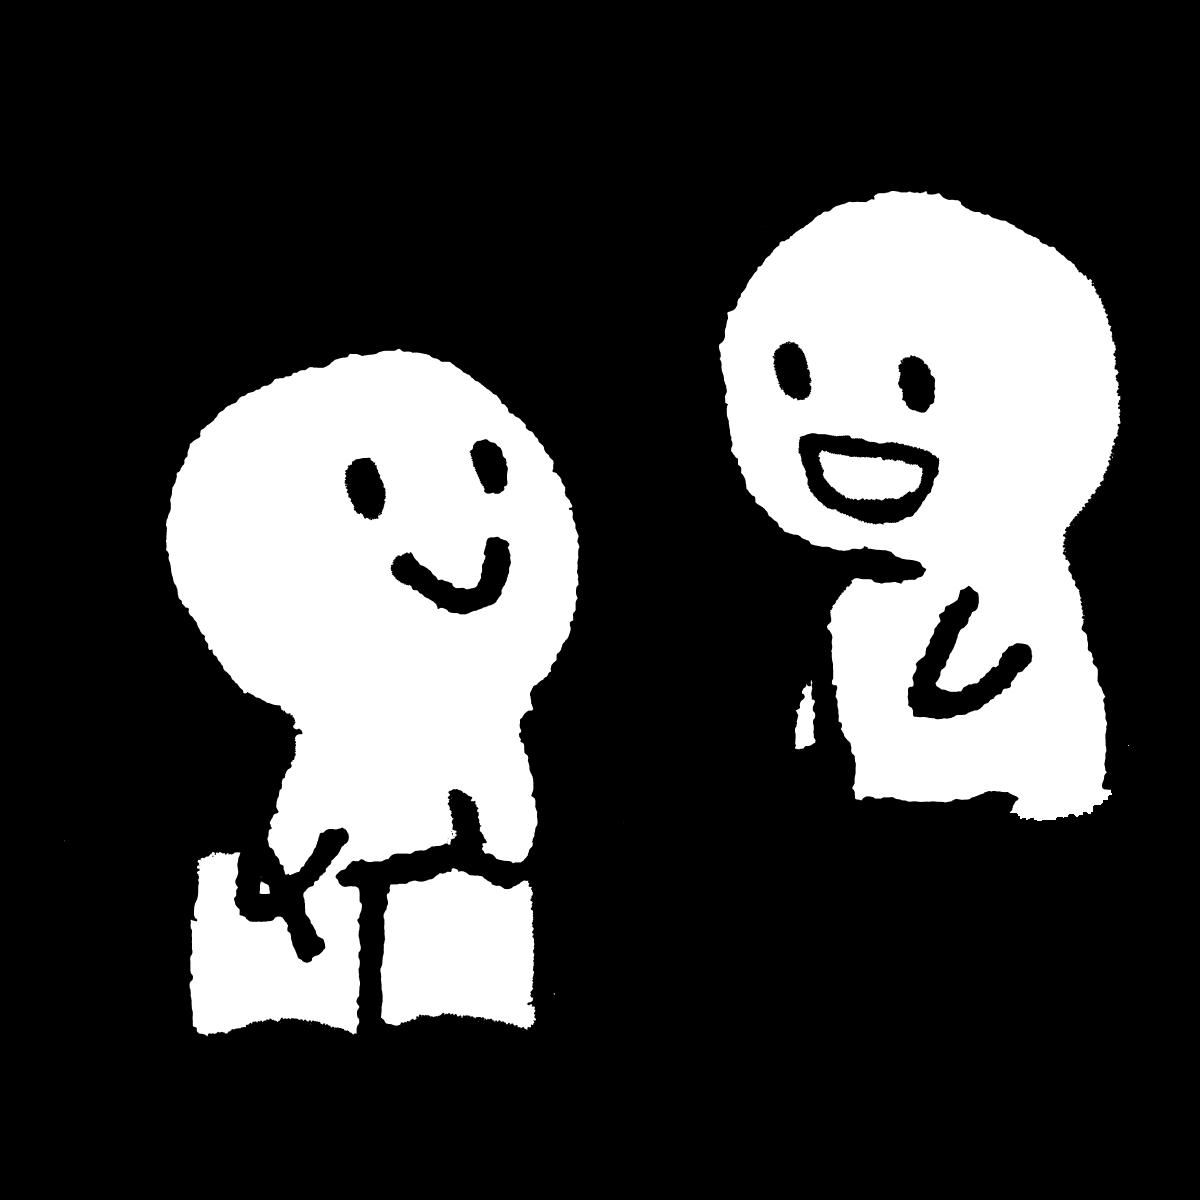 f:id:ito-e:20200527104708p:plain